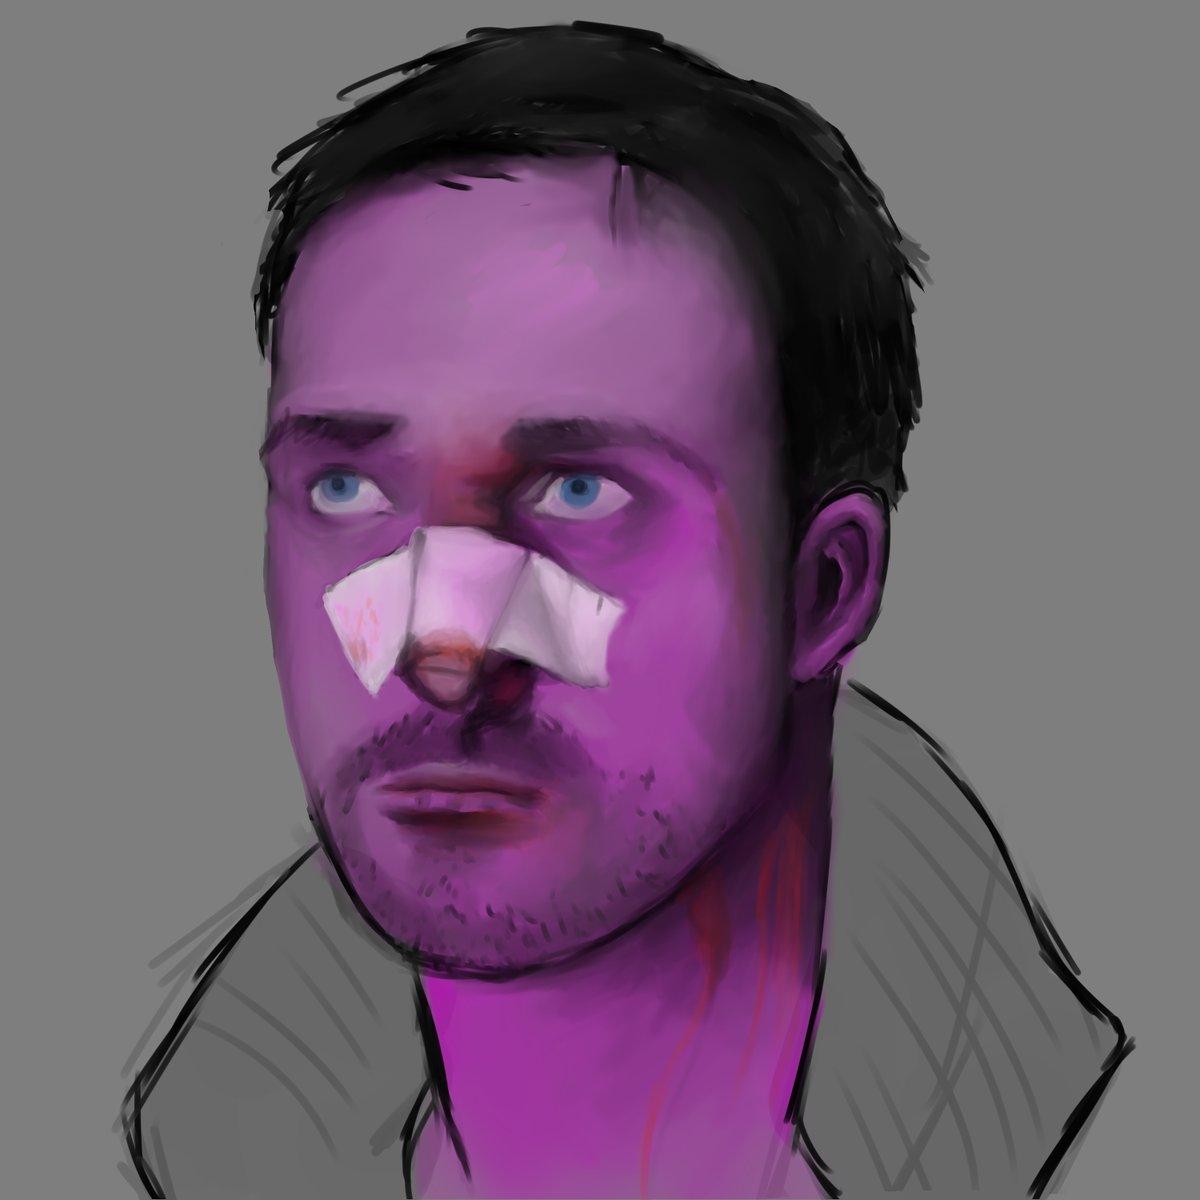 crappy 2024 painting  #painting #BladeRunner2049 #Fanart #art #cyberpunk https://t.co/5VXf9EfWhN